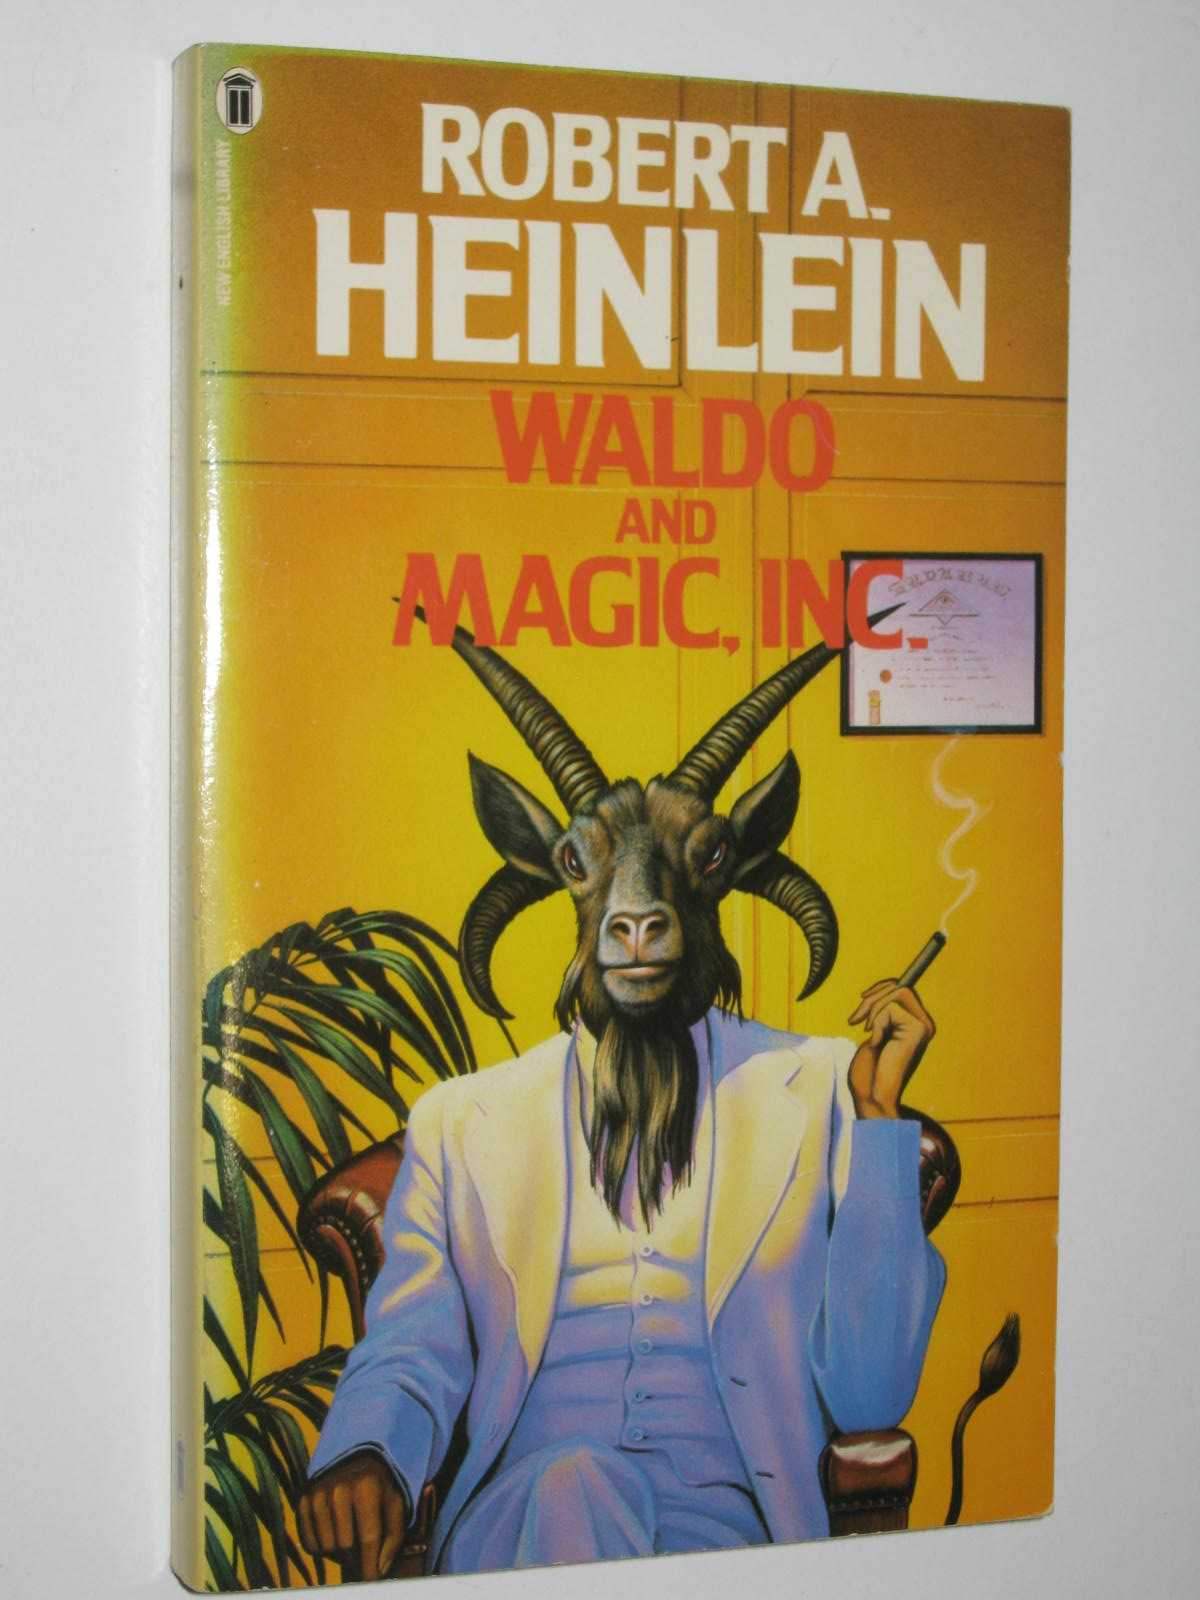 Image for Waldo and Magic, Inc